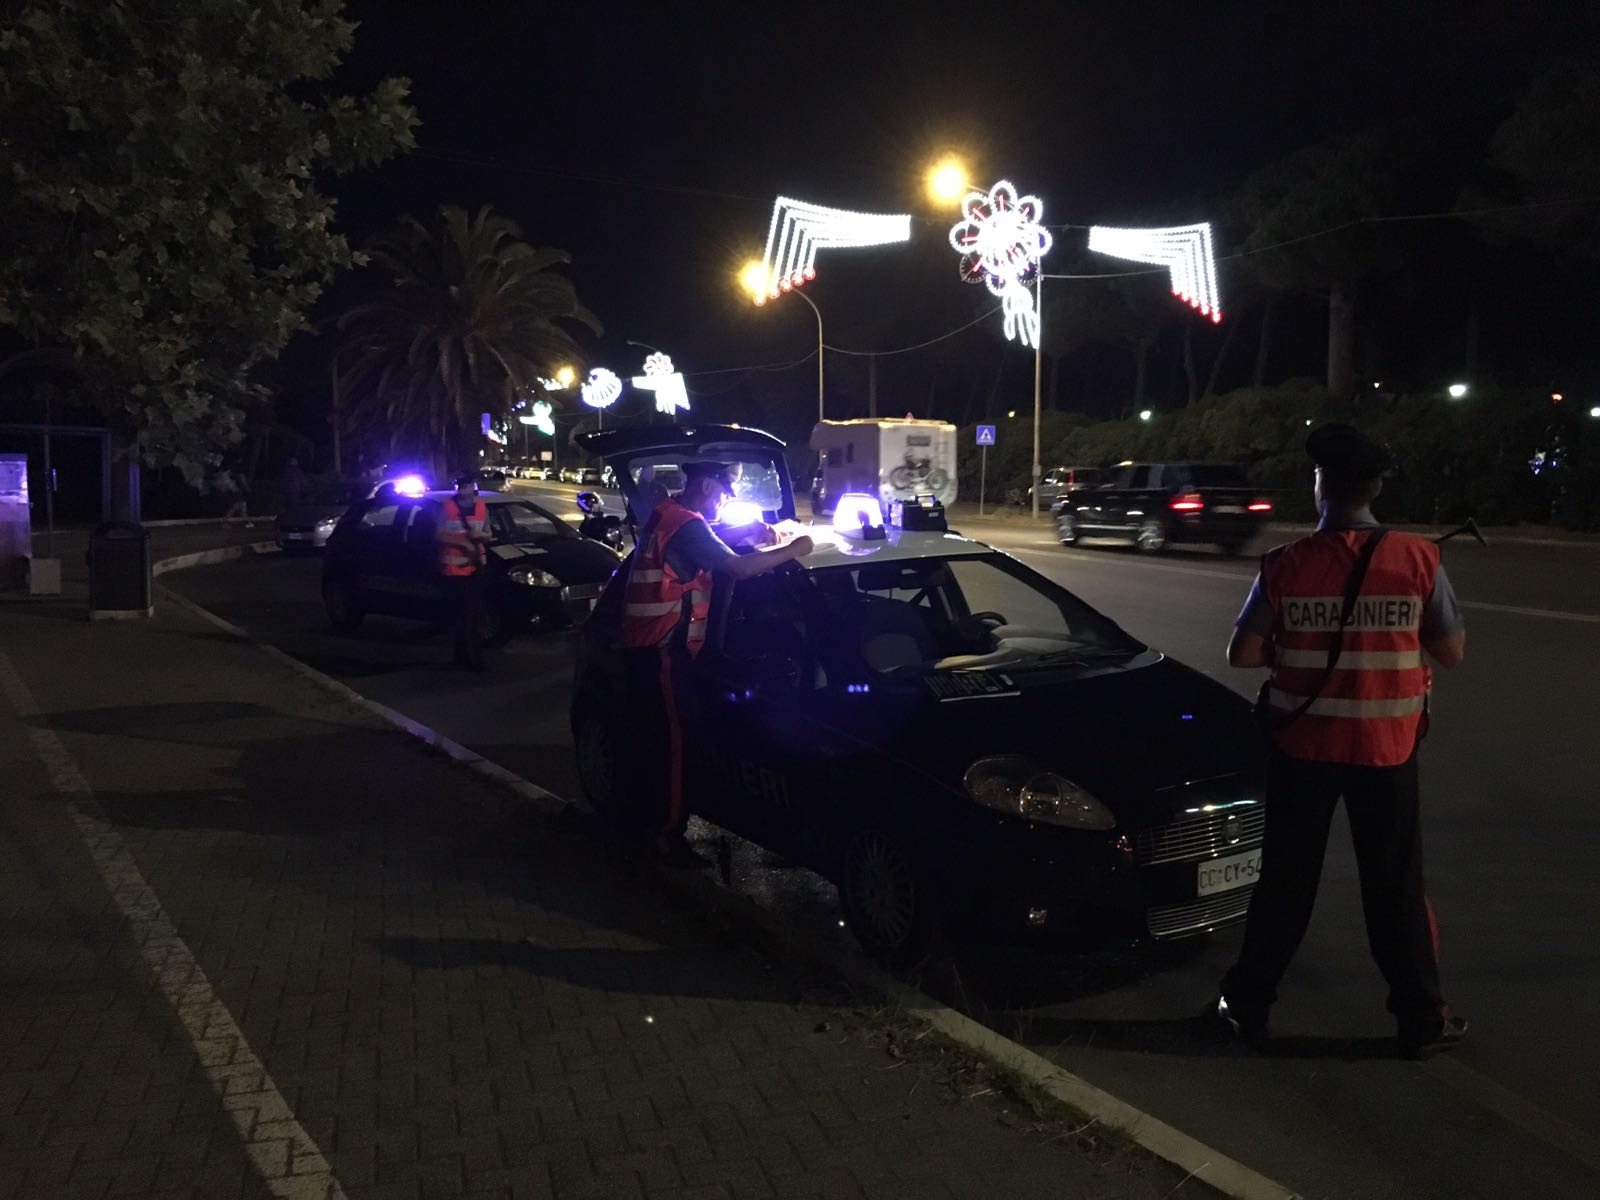 Movida estiva, controlli straordinari dei Carabinieri